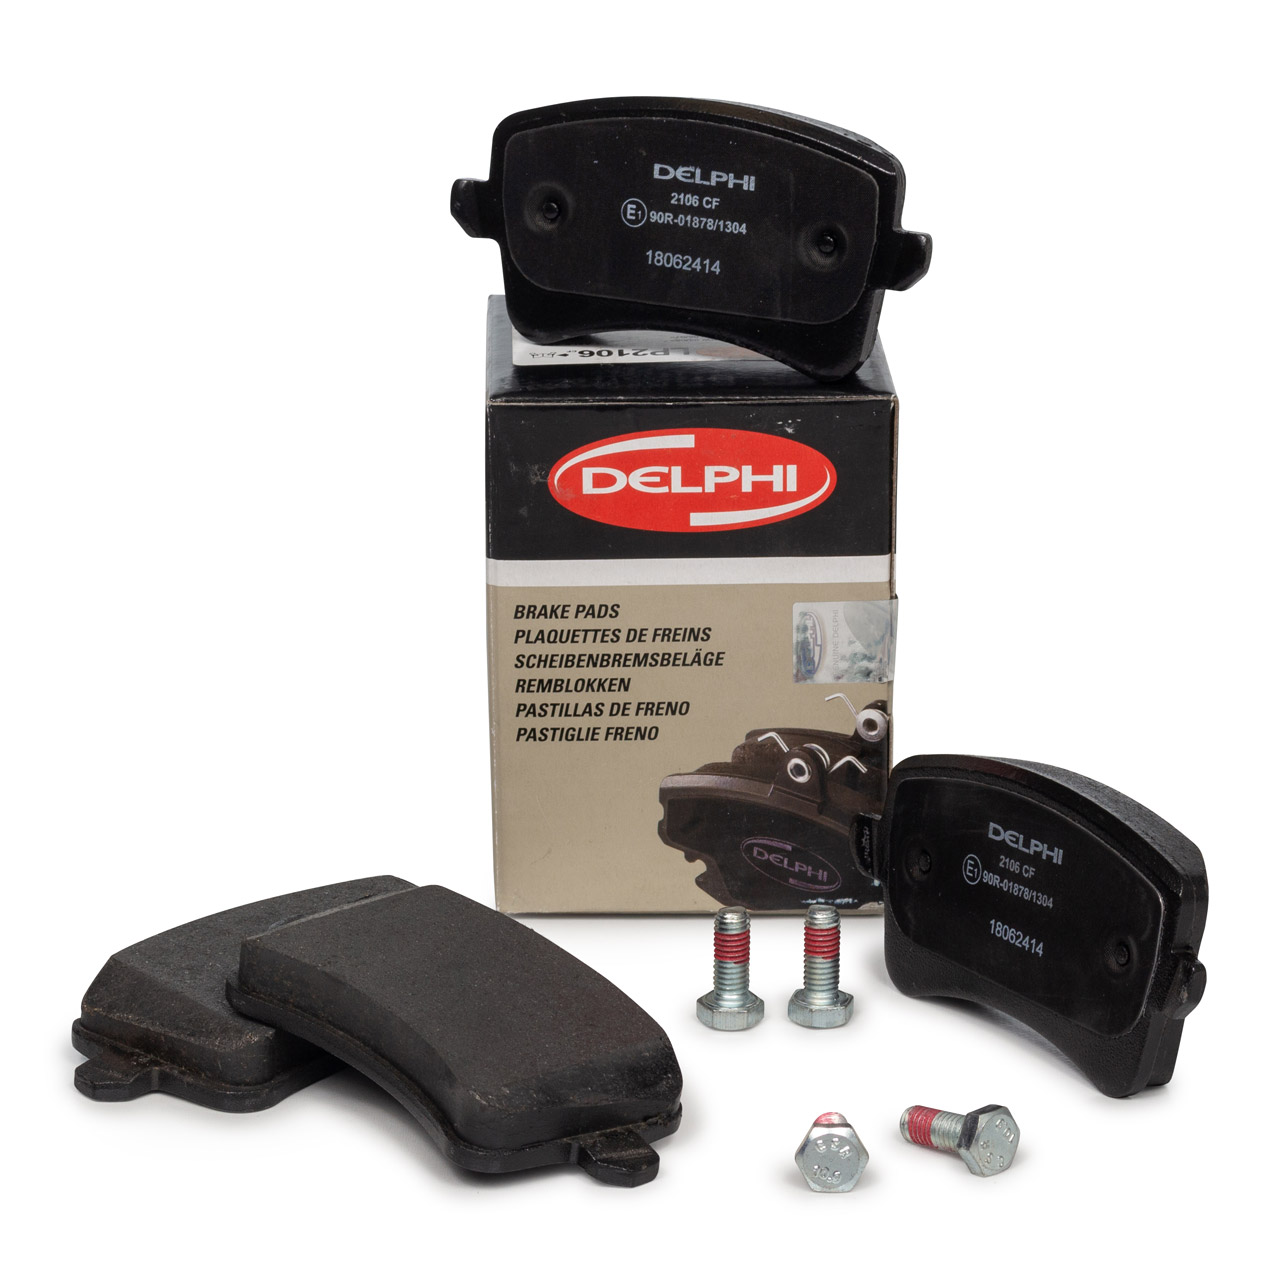 DELPHI Bremsbeläge Bremsklötze für AUDI A4 (8K B8) A5 (8T 8F) Q5 (8RB) hinten